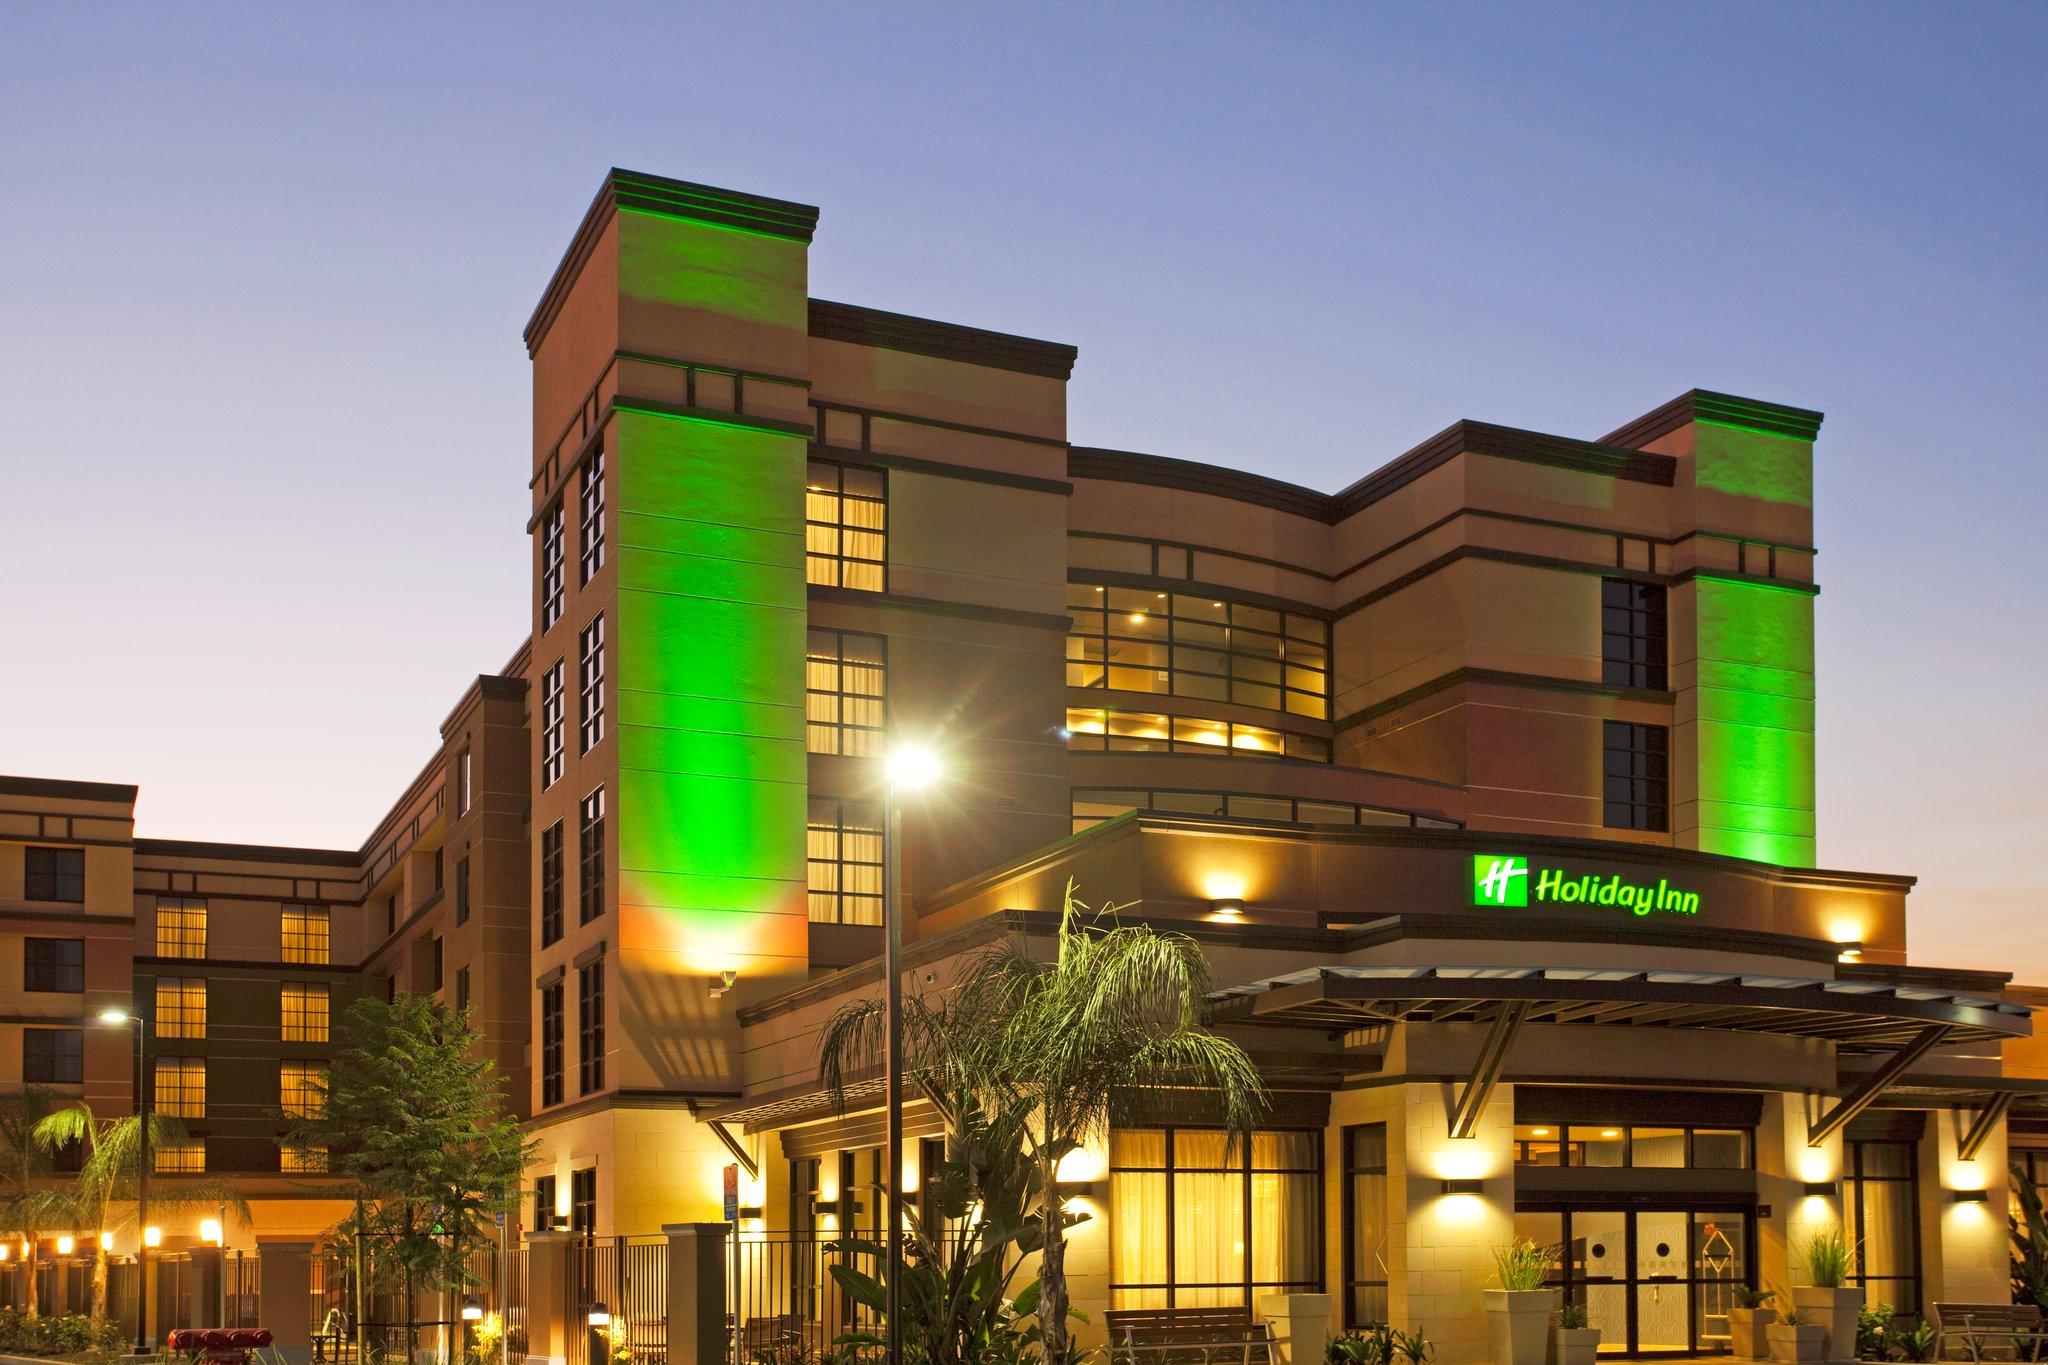 Holiday Inn Irvine South